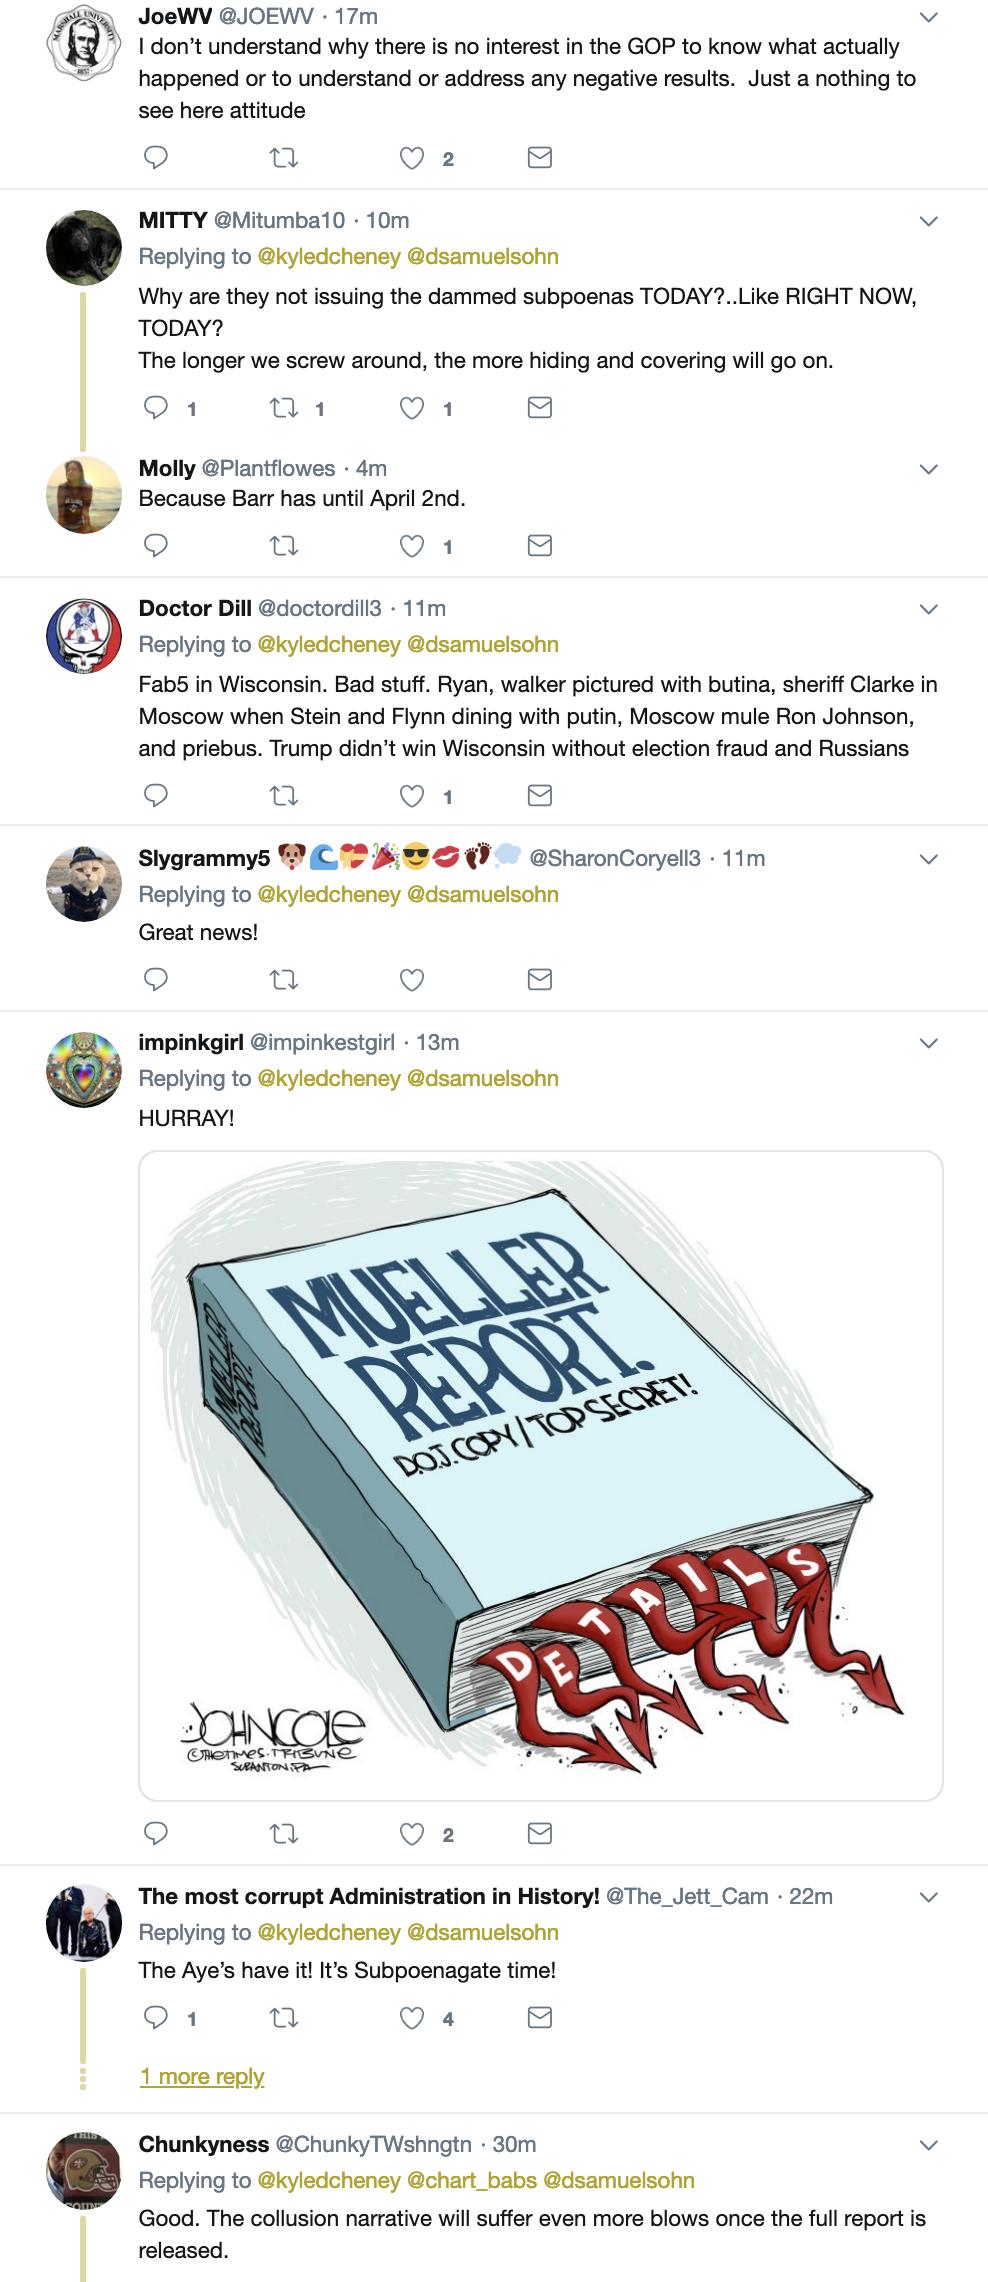 Screen-Shot-2019-04-01-at-8.05.42-AM Judiciary Committee Drops Unedited Mueller Report Bombshell Corruption Crime Donald Trump Investigation Mueller Politics Robert Mueller Russia Top Stories